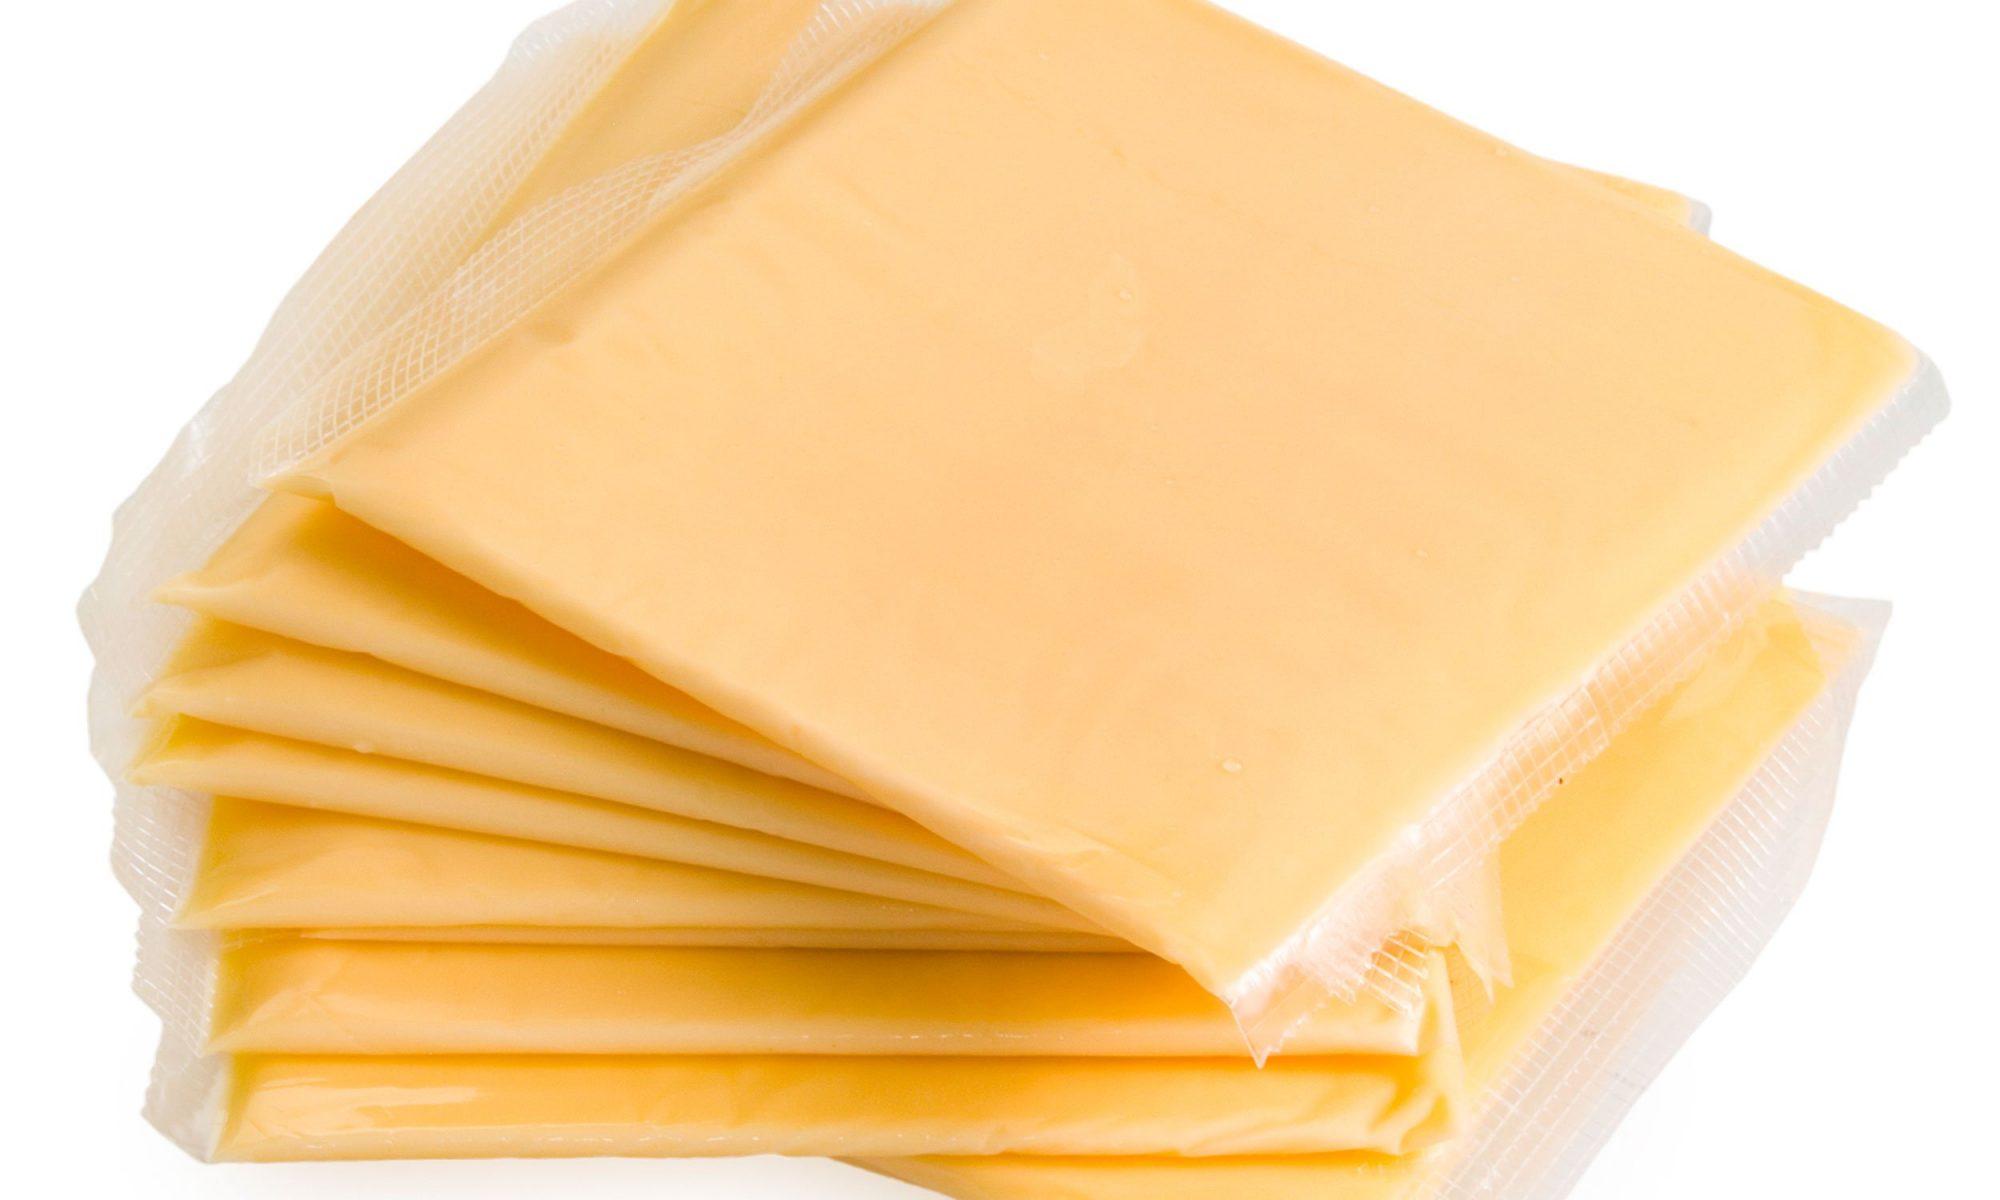 EC: What Are Kraft Singles and Velveeta Really Made Of?